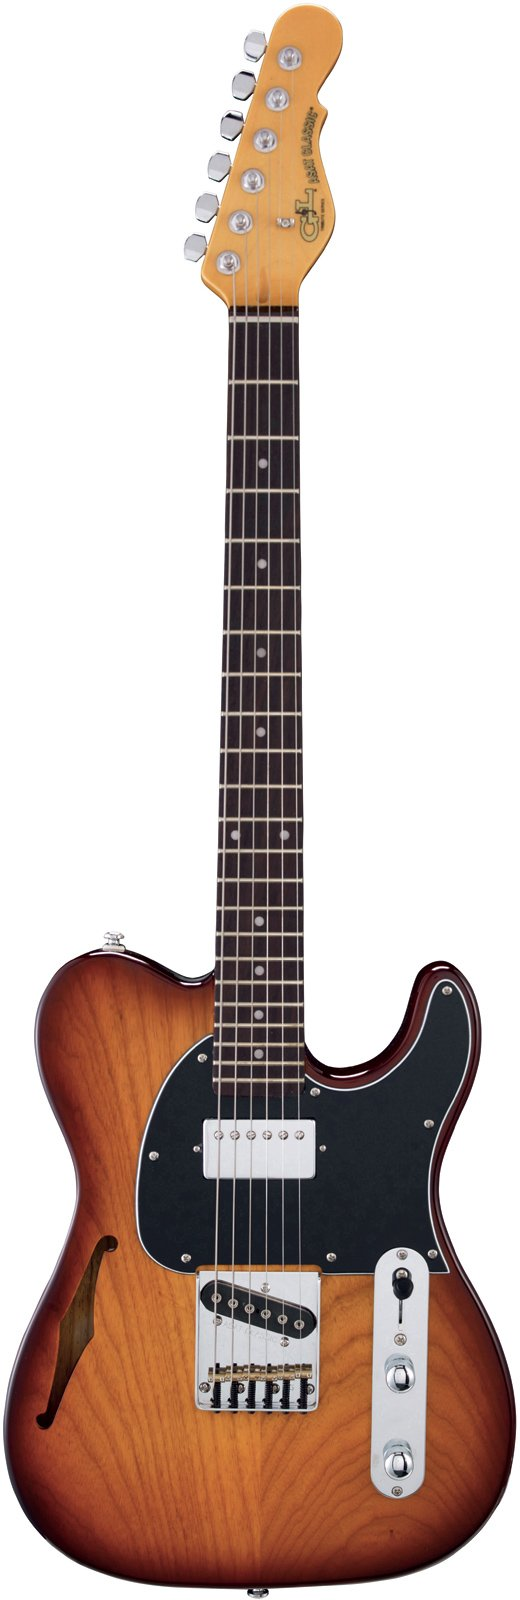 G&L Tribute ASAT Classic Bluesboy Semi-Hollow Electric Guitar Tobacco Sunburst Rosewood Fretboard (Color: Tobacco Sunburst)